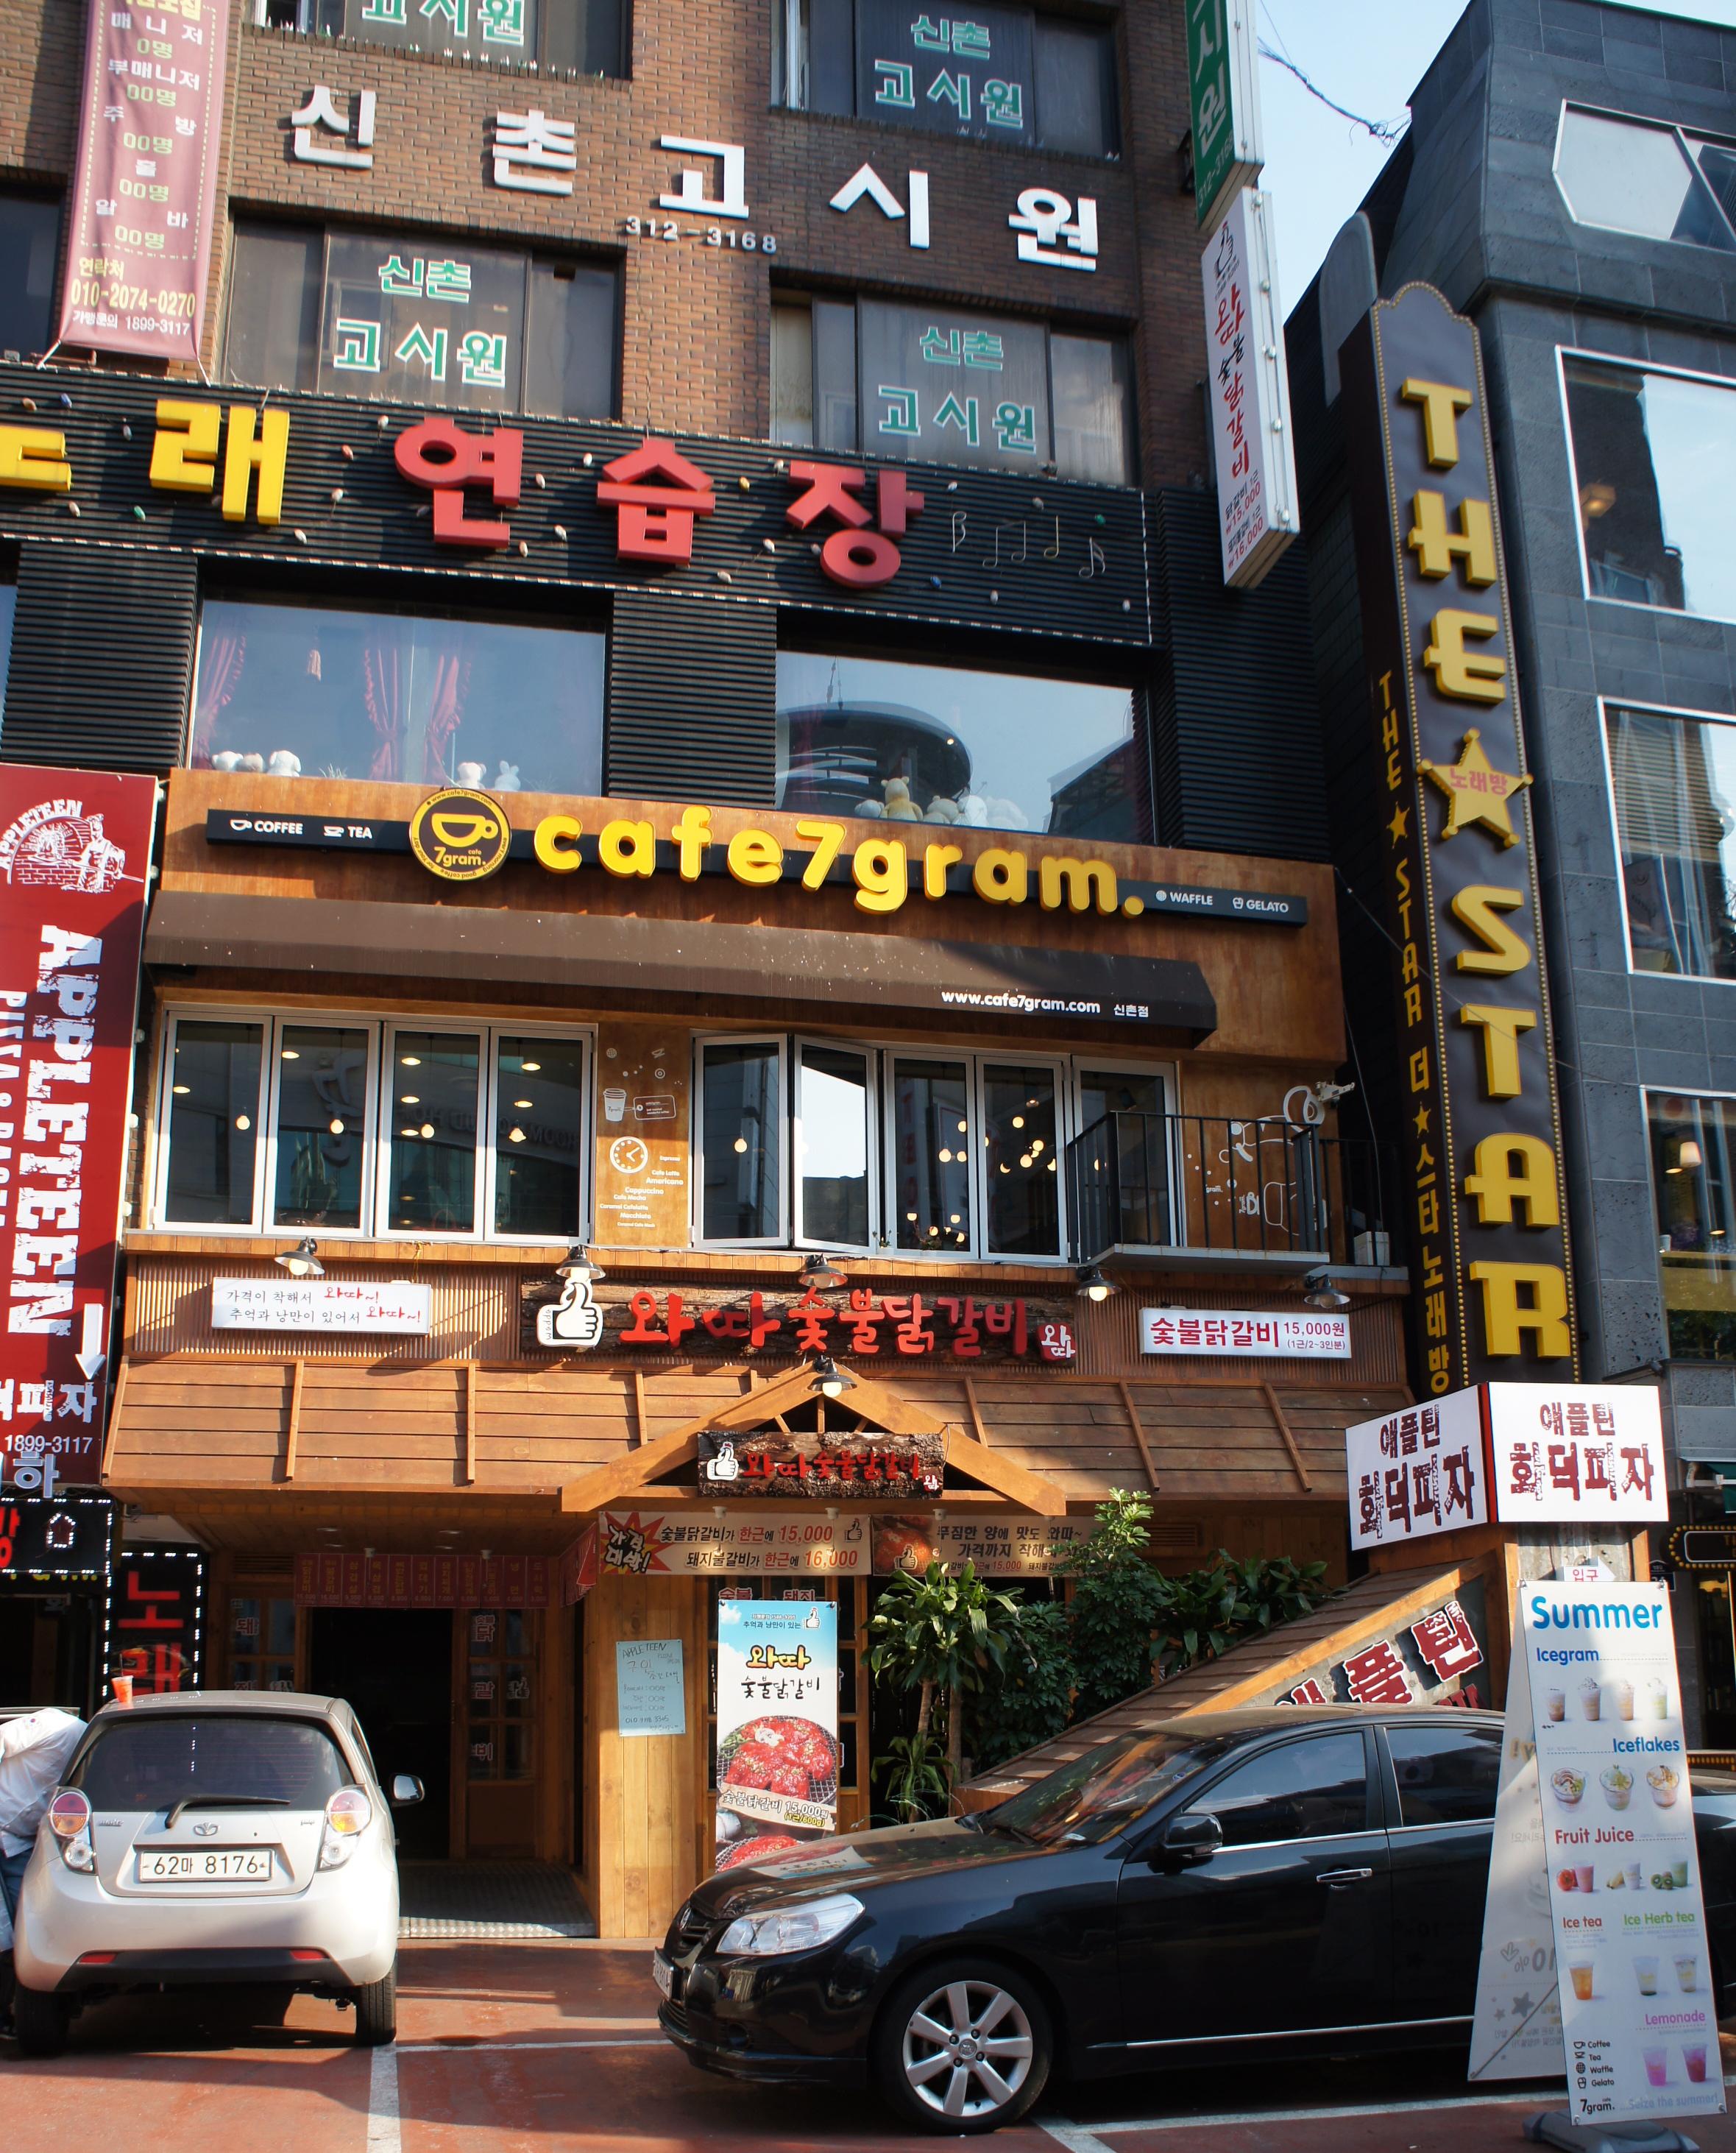 dak bulgogi – Korean BBQ chicken | dramasROK